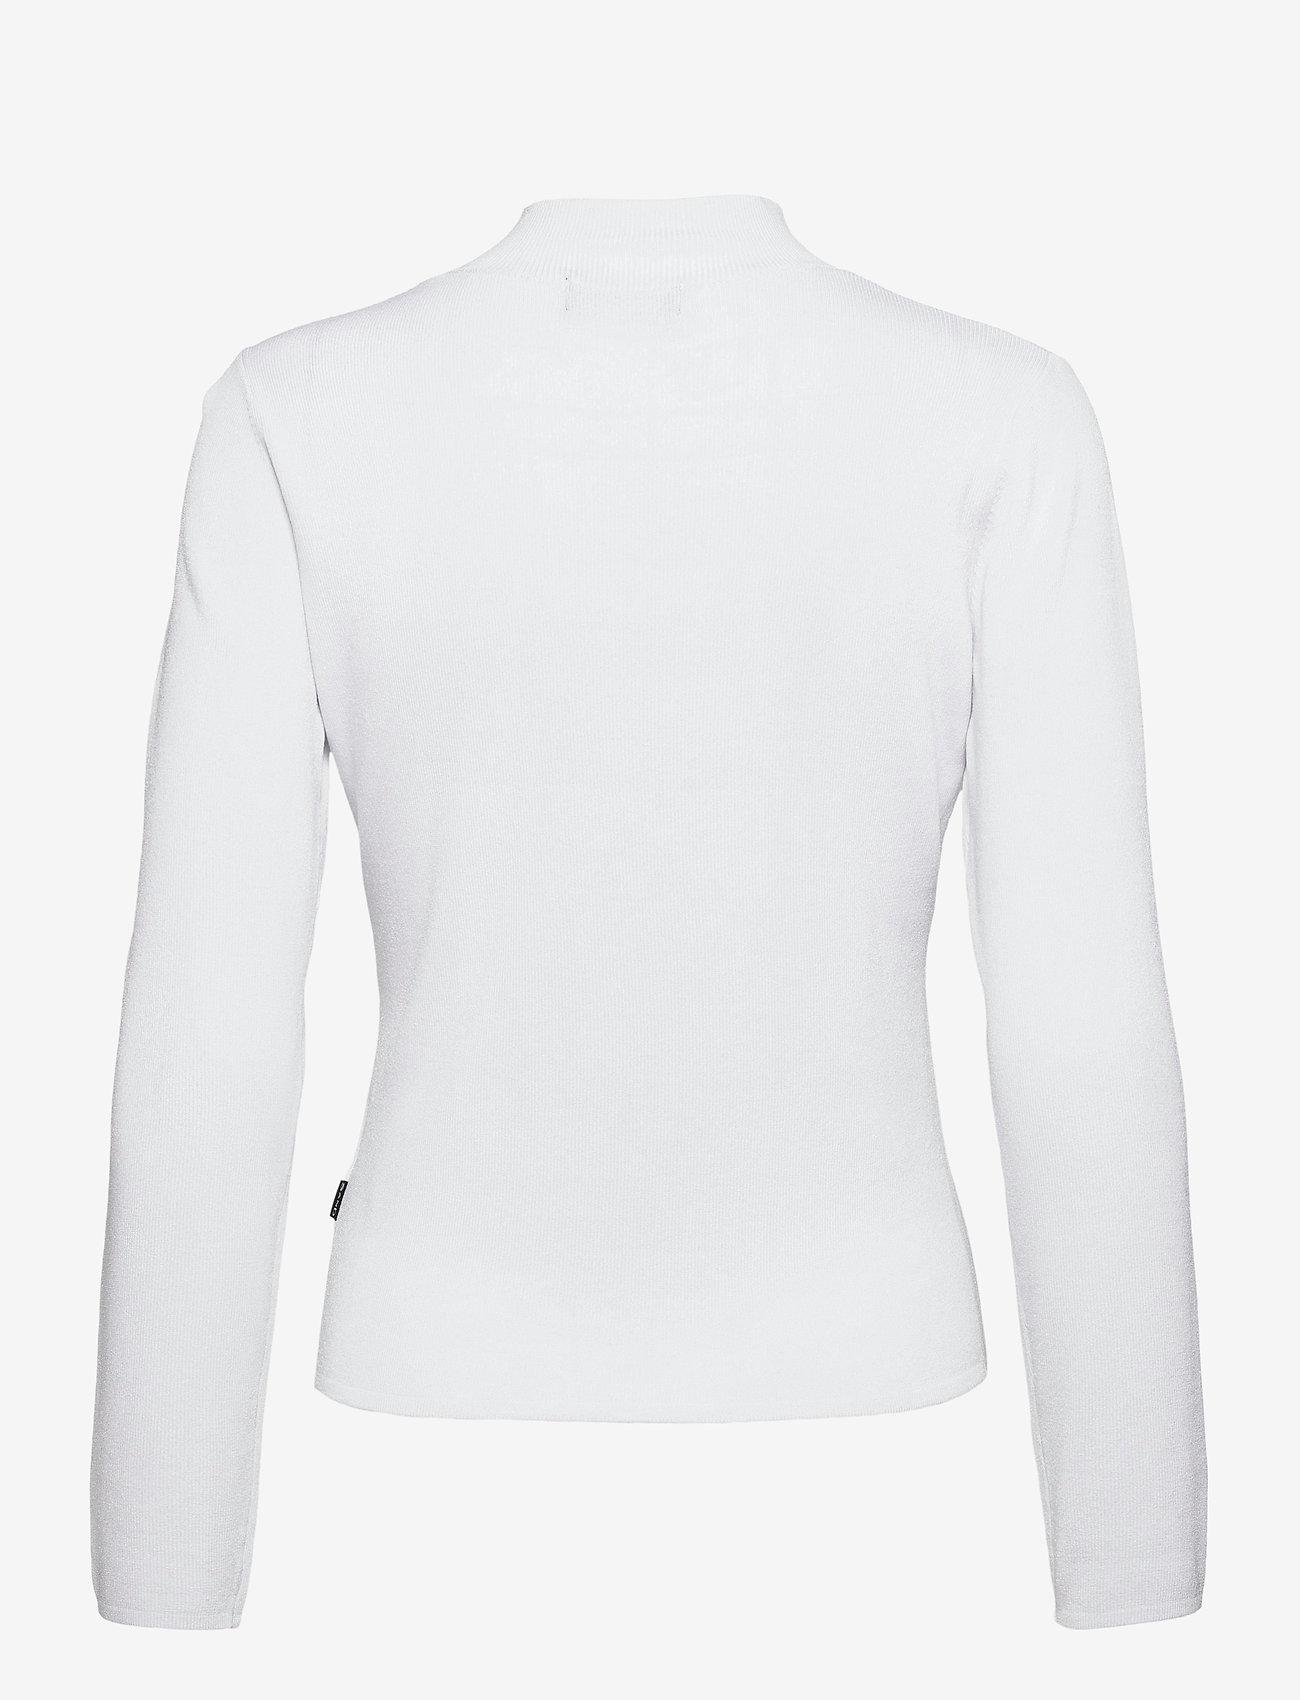 SAND - 5181 - Della Zip - cardigans - white - 1